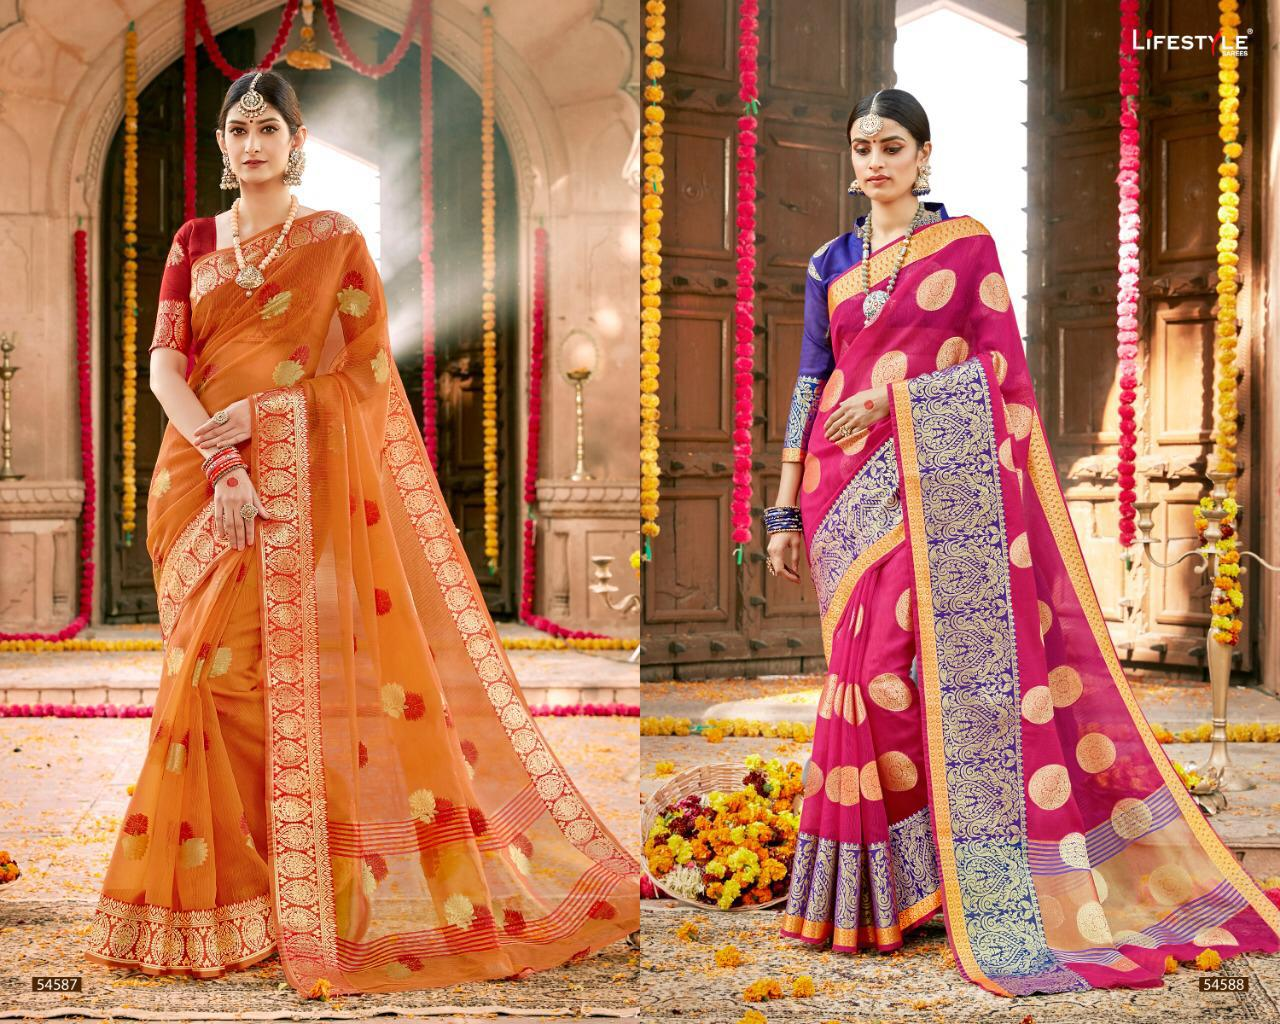 Lifestyle Kavita Vol 2 Talariya Cheks Sarees Wholesale